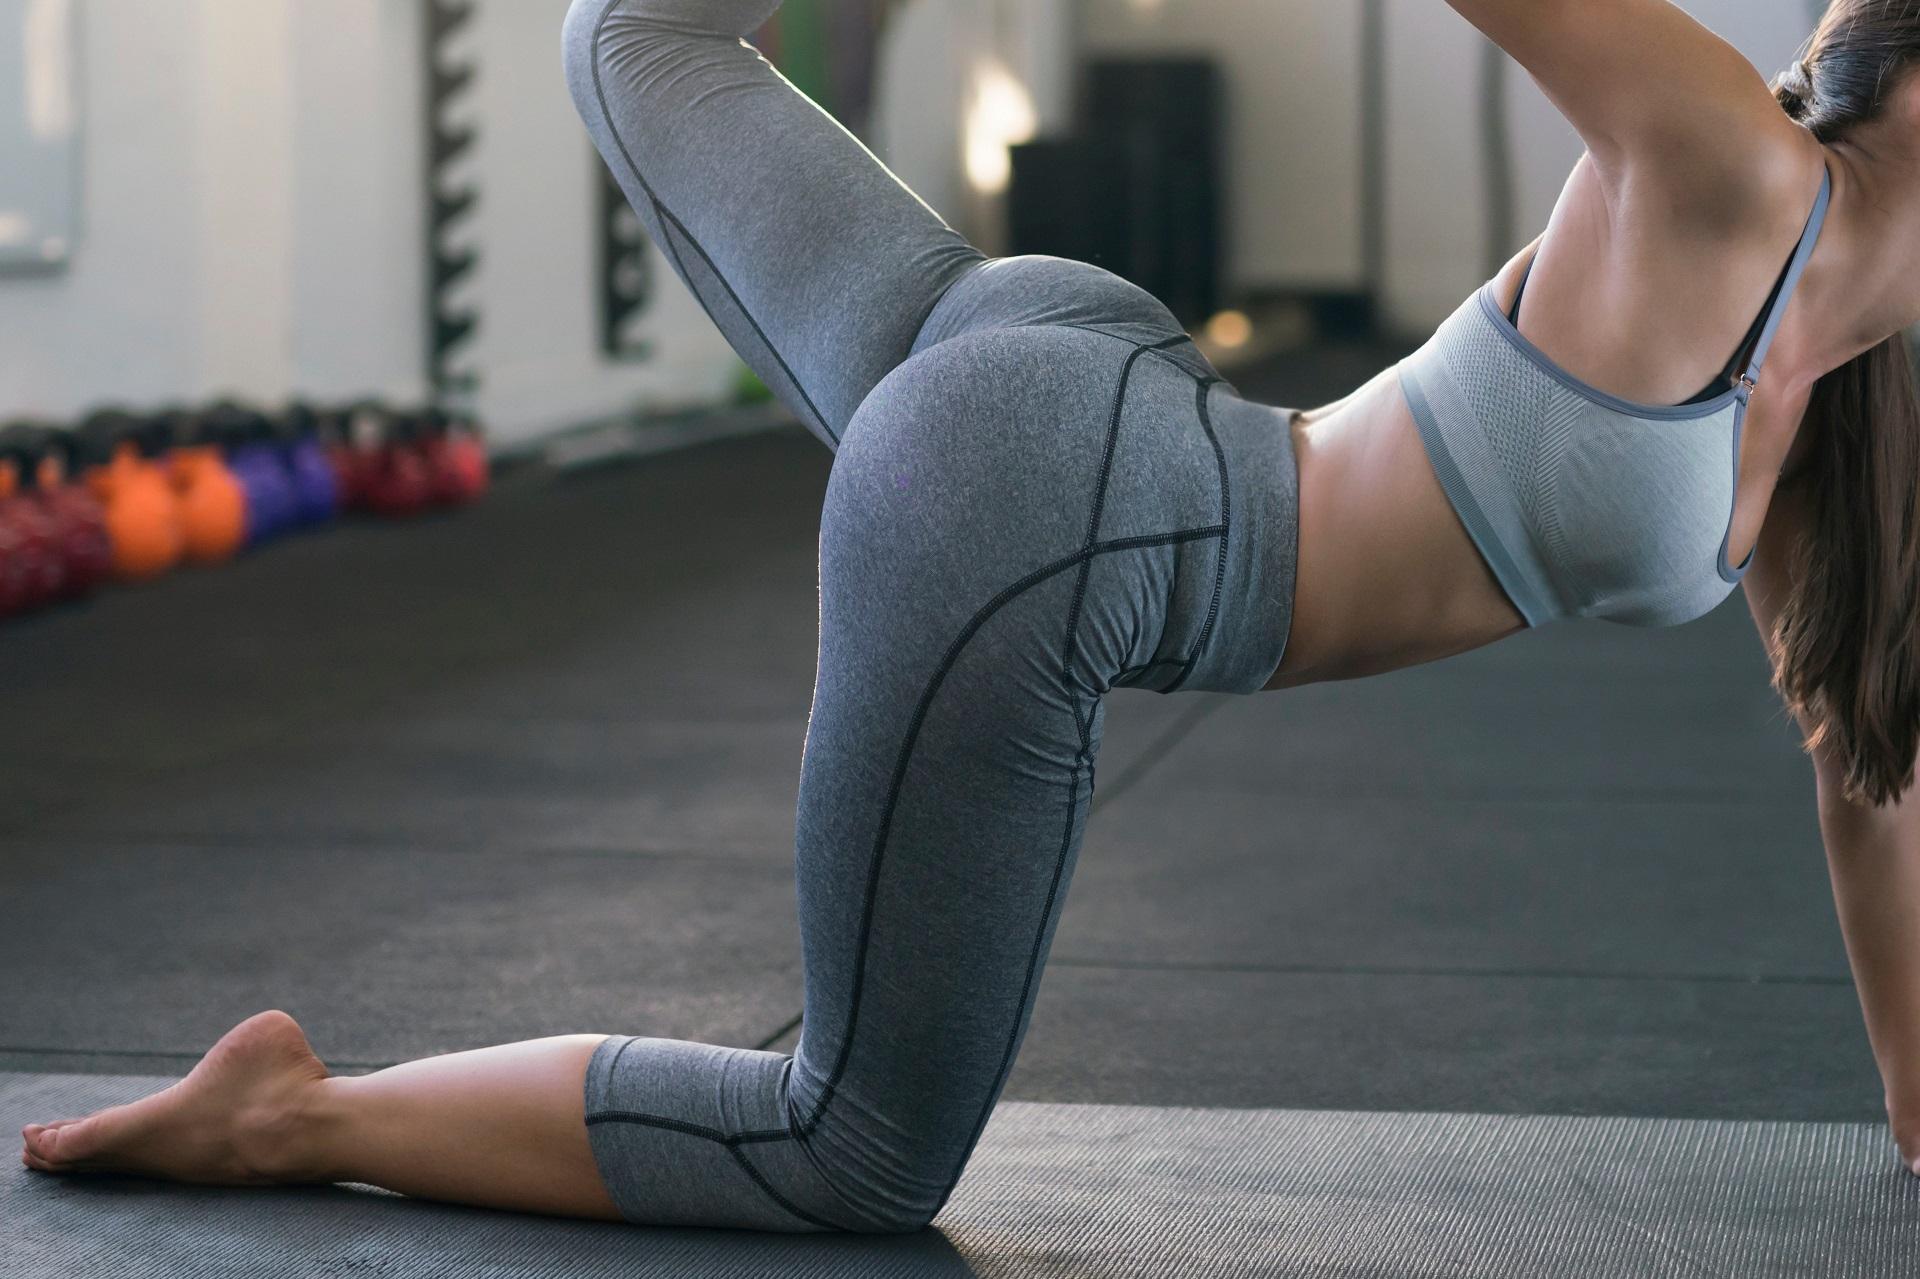 People 1920x1279 women model ass legs yoga yoga pose yoga pants feet sports bra sportswear skinny fitness model pointed toes